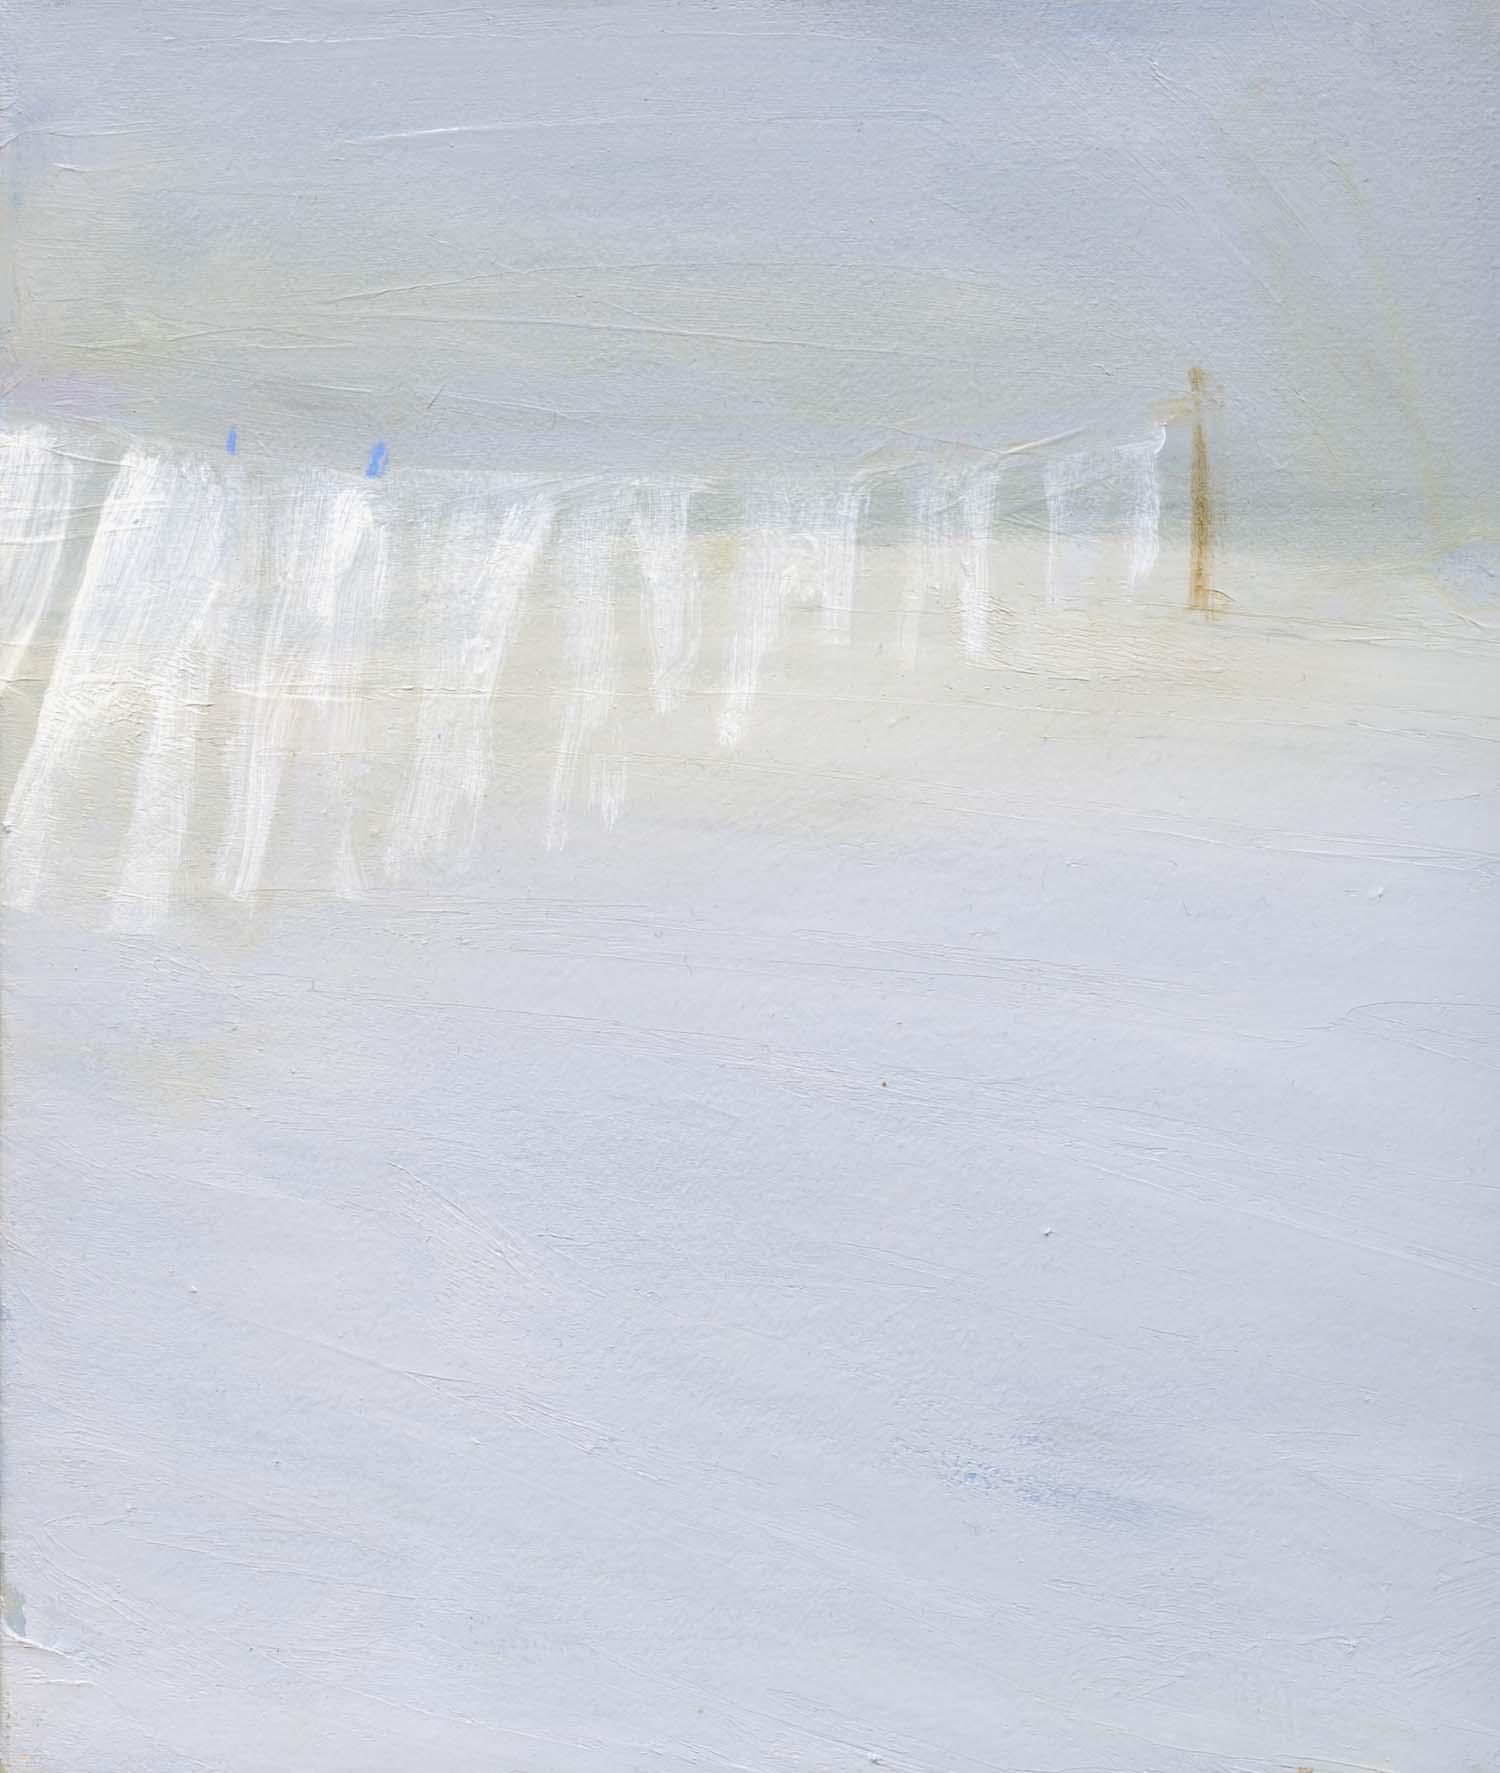 Ghostline, 2008 26.5 x 23 cm oil on canvas